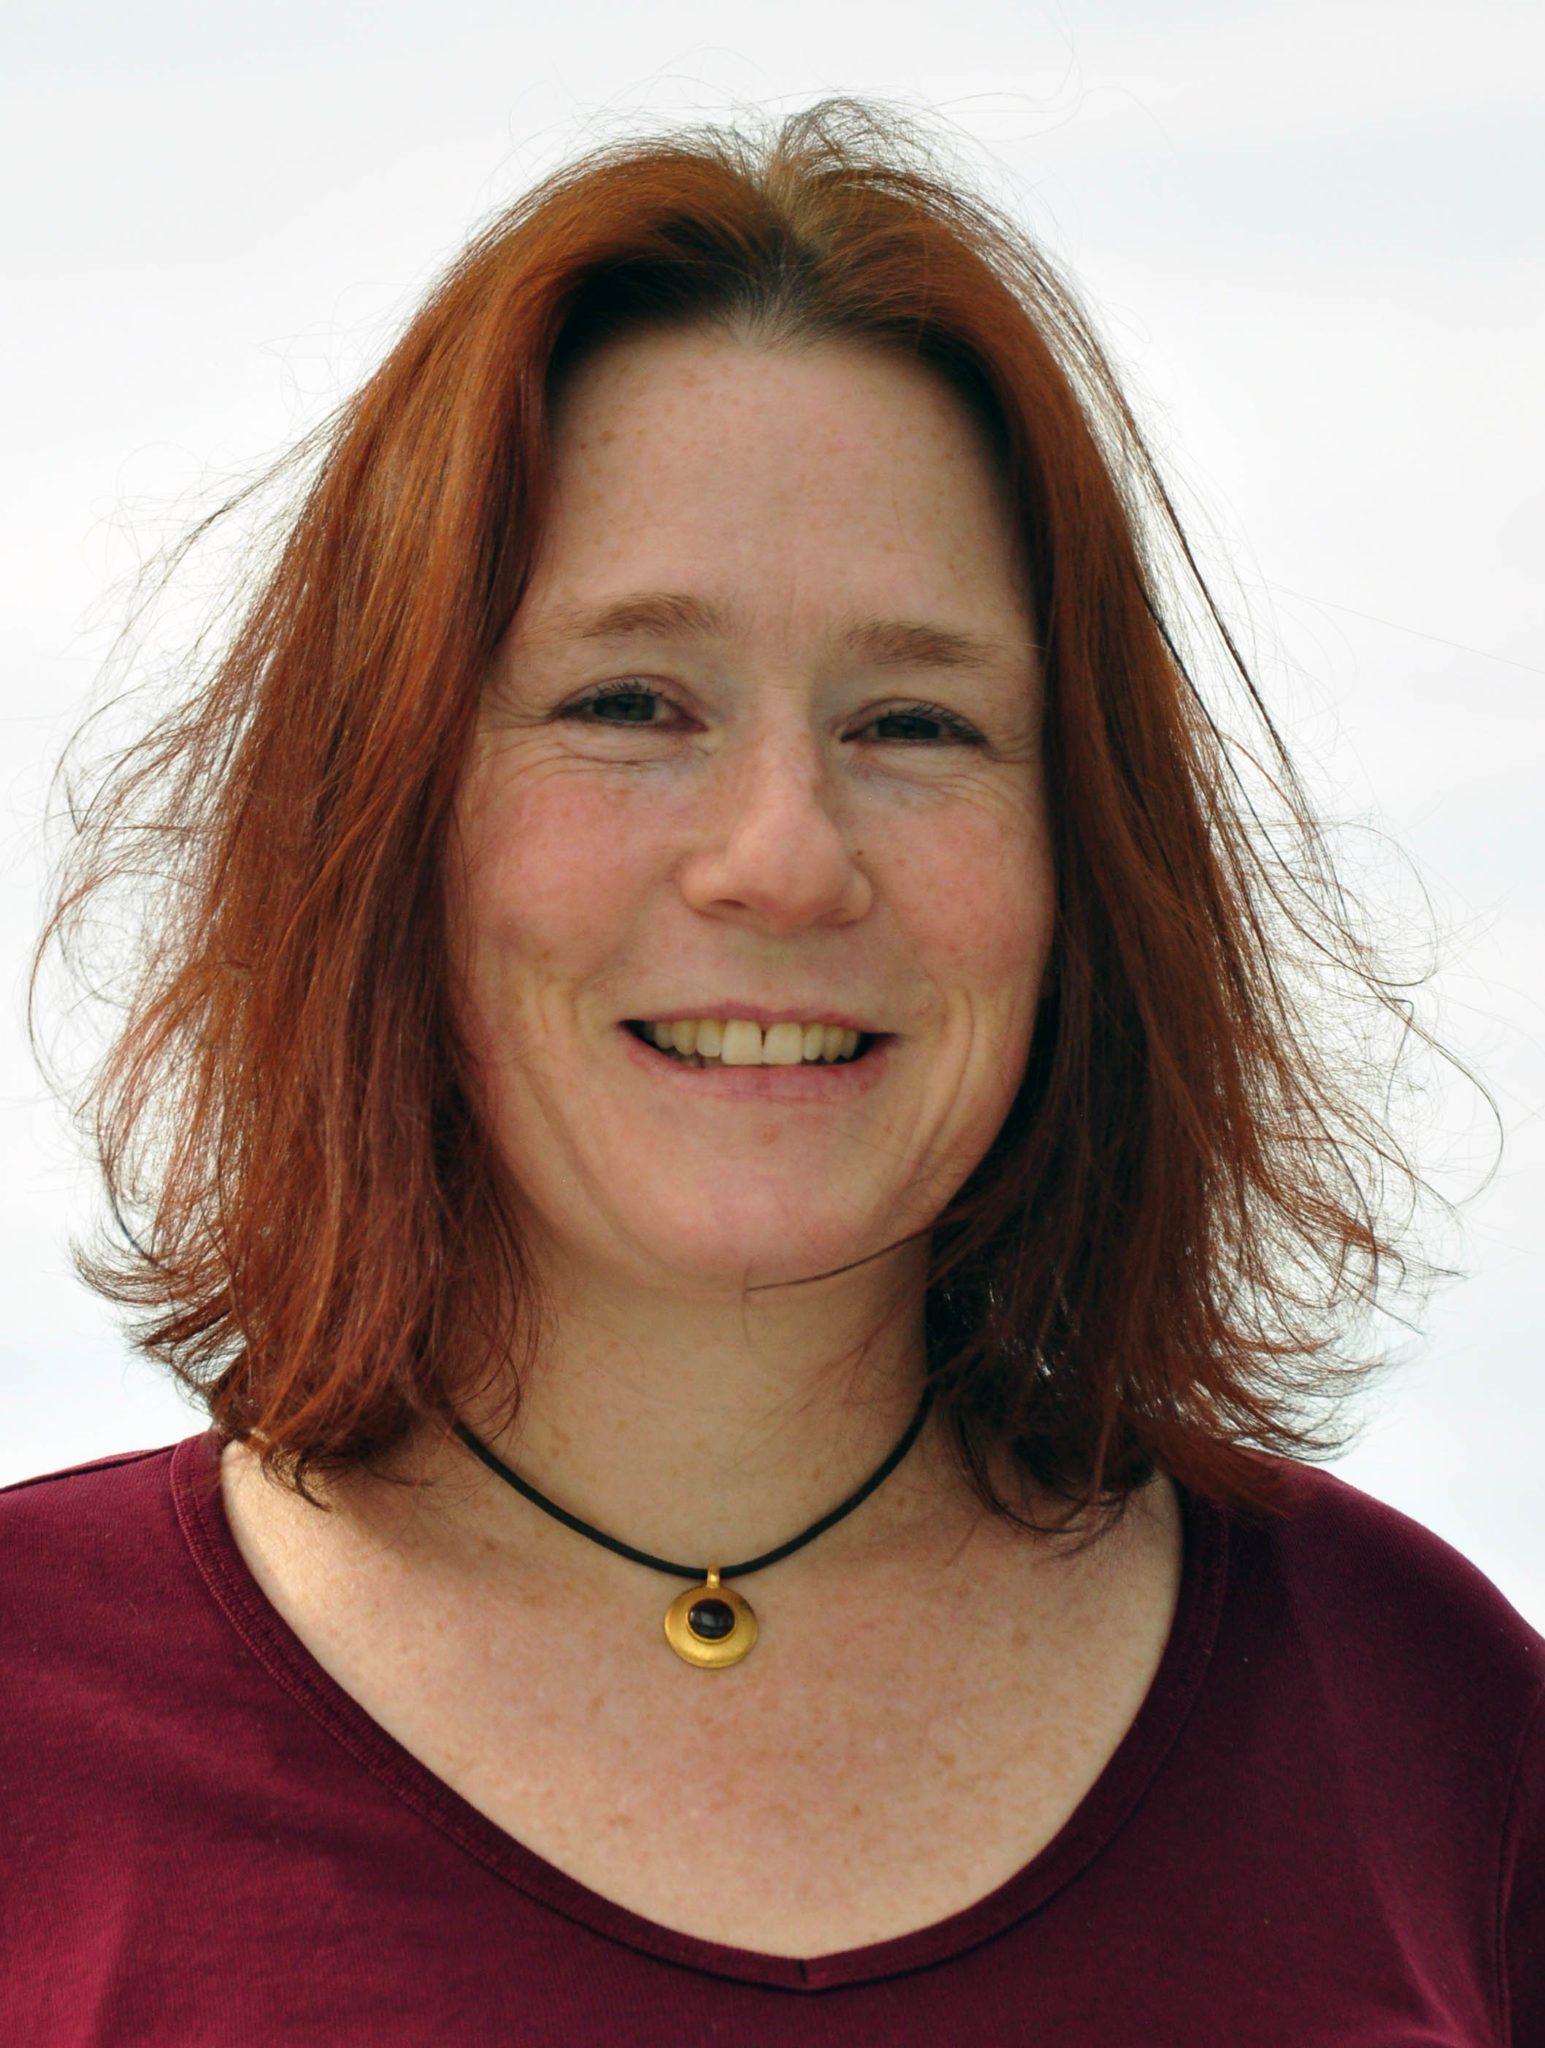 Lebenslauf - Chantal Locher